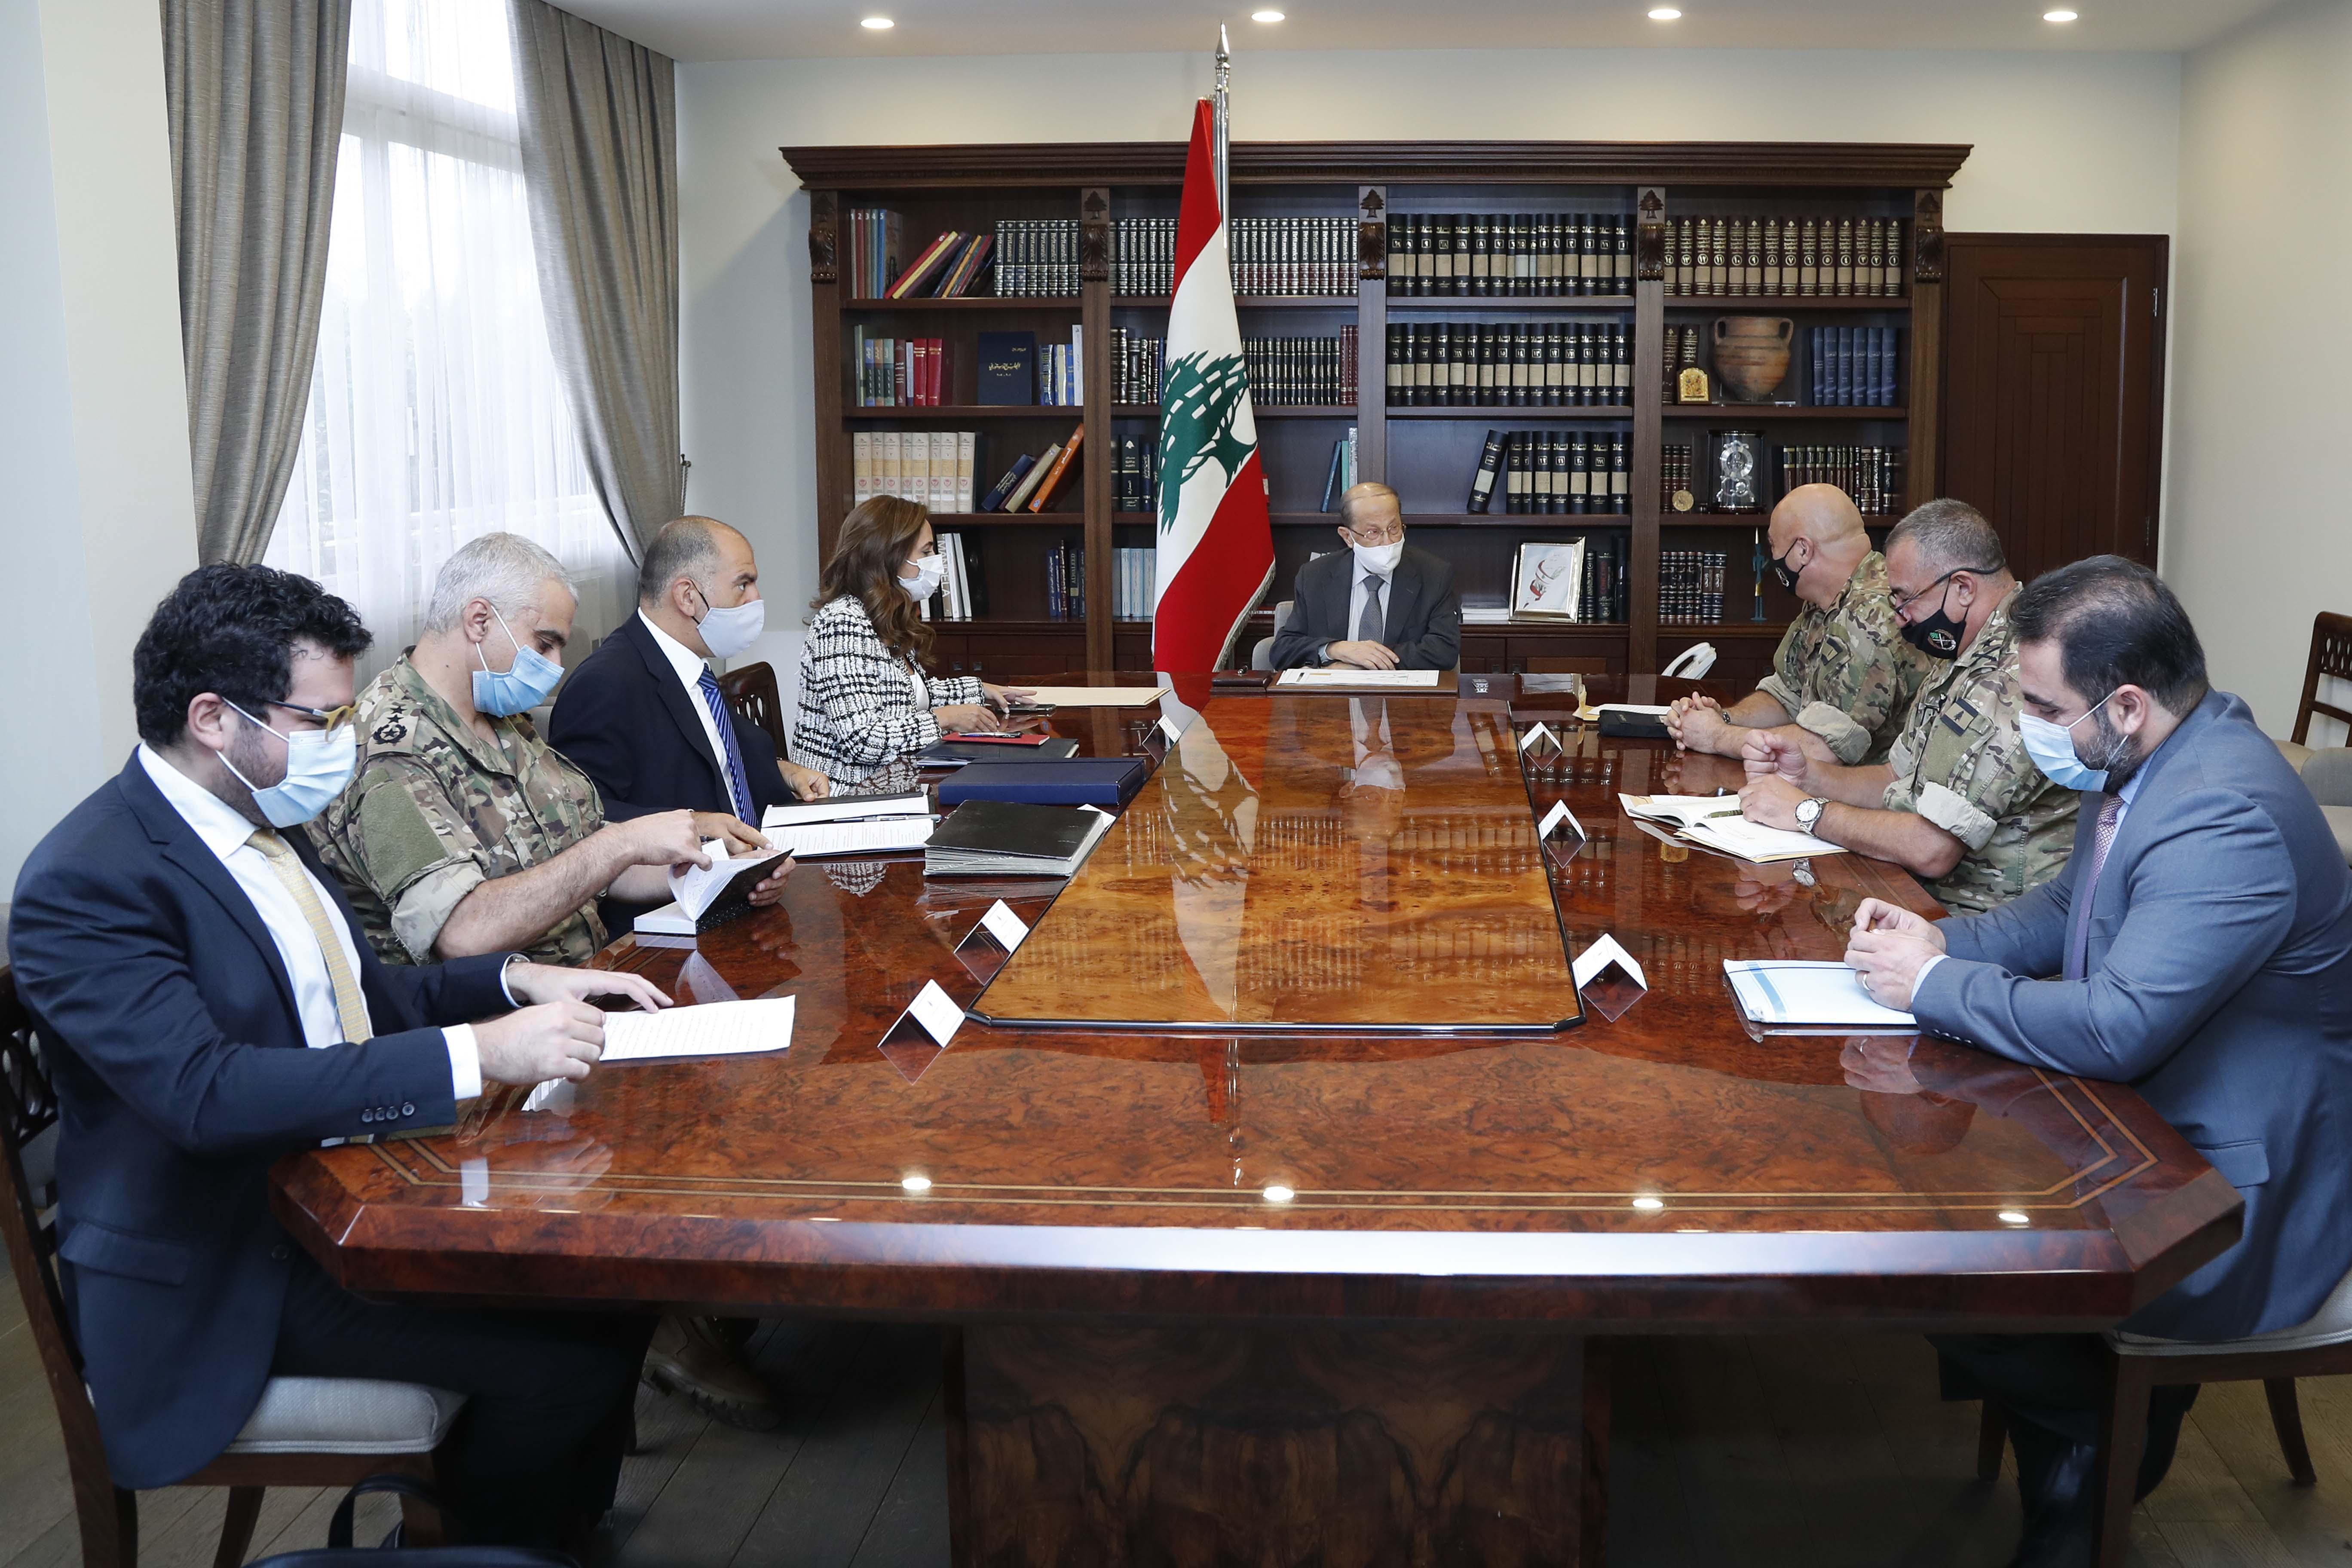 02 -General Joseph Aoun